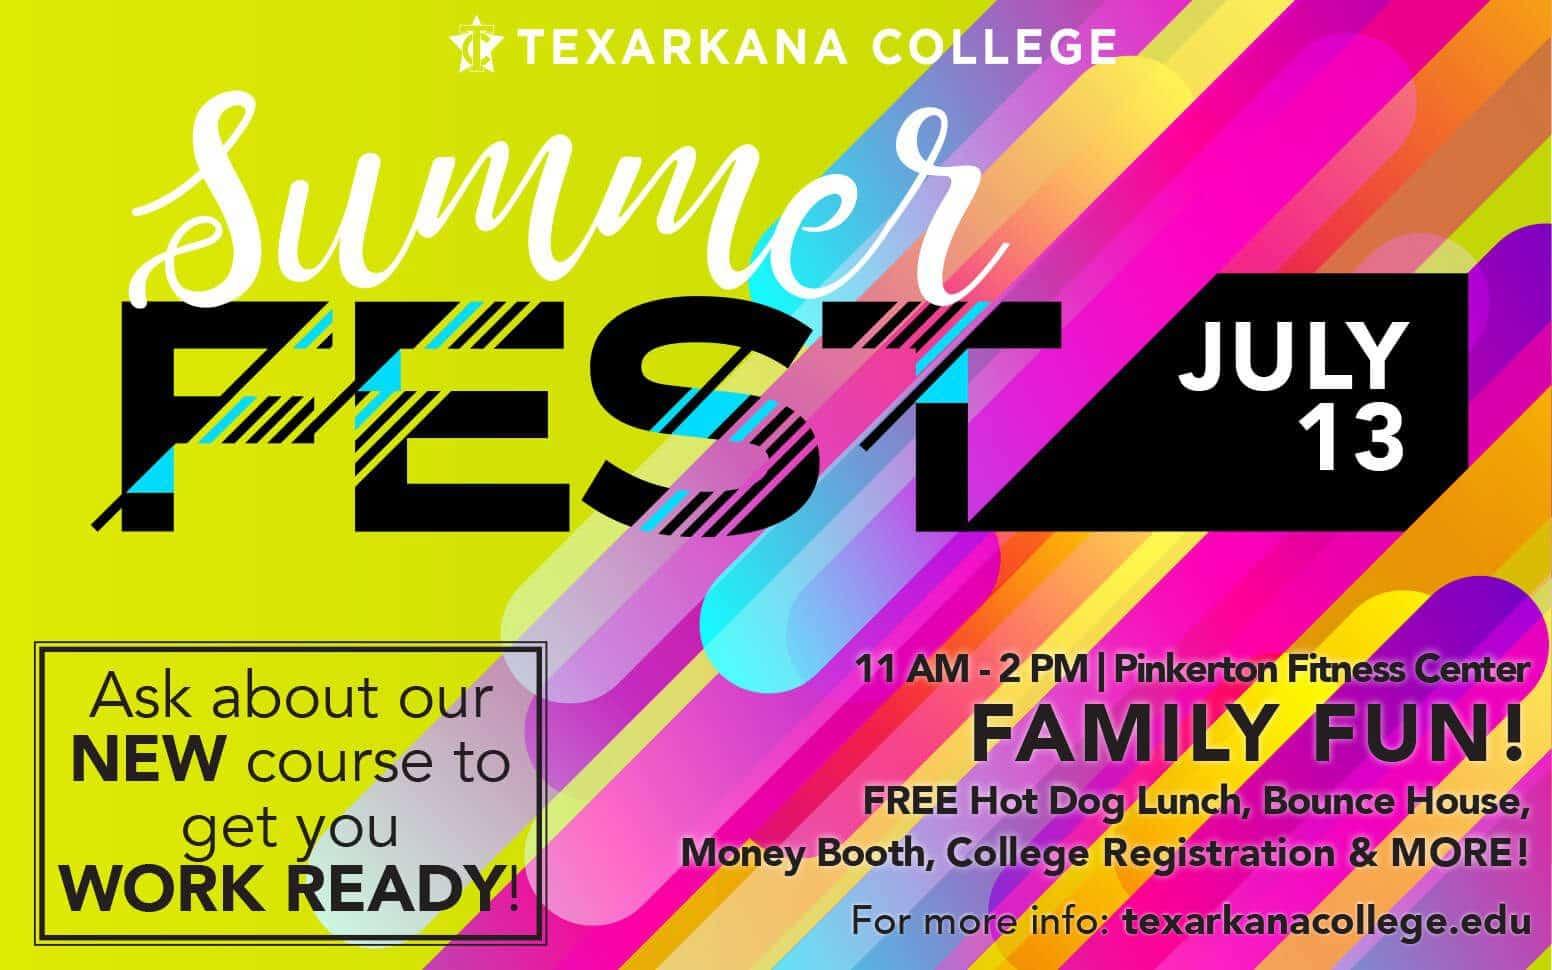 Summer Fest 2018 - July 13, 2018